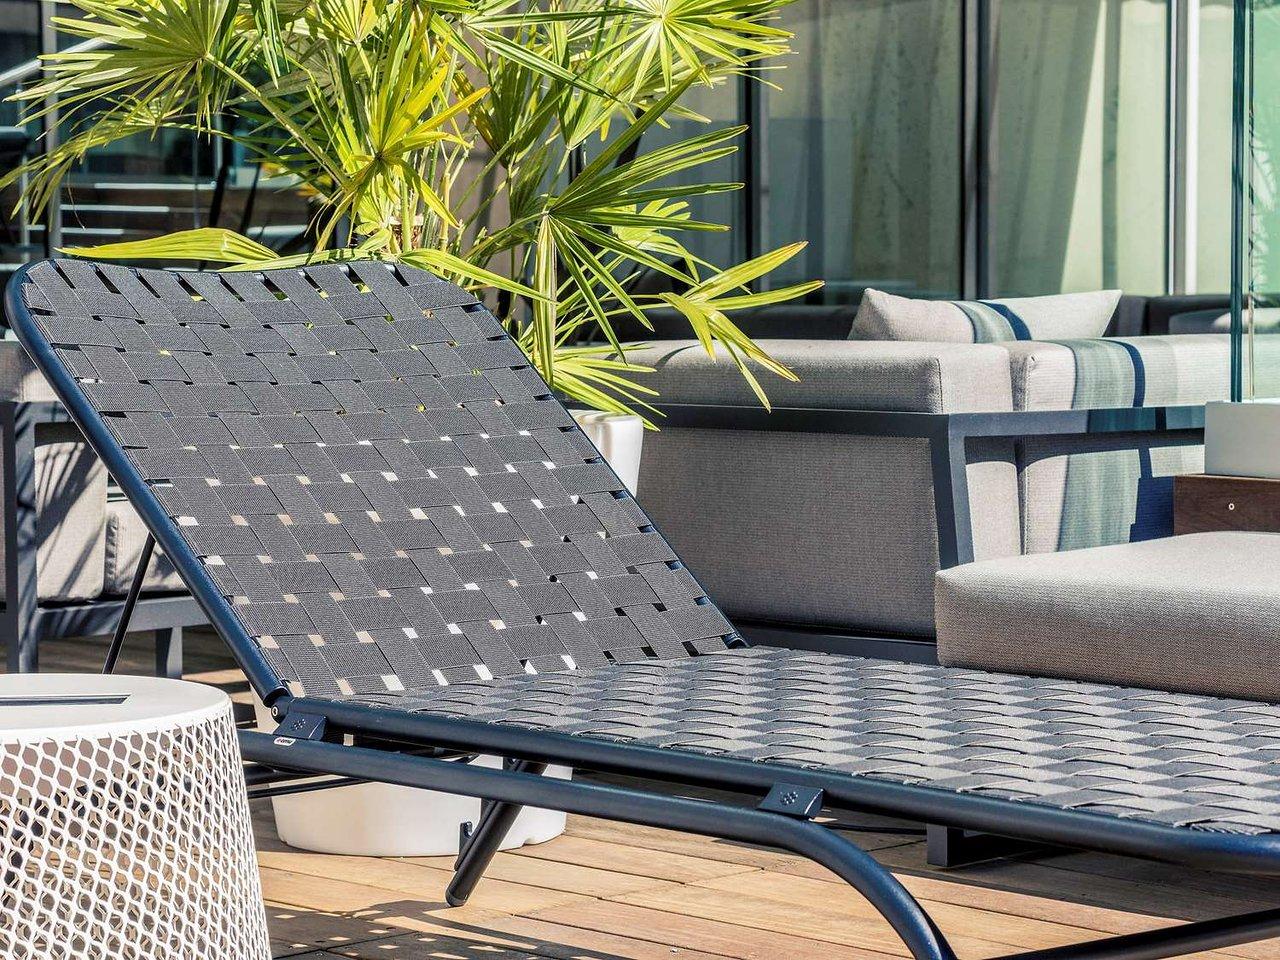 mercure toulouse centre saint georges updated 2019 prices hotel rh tripadvisor com